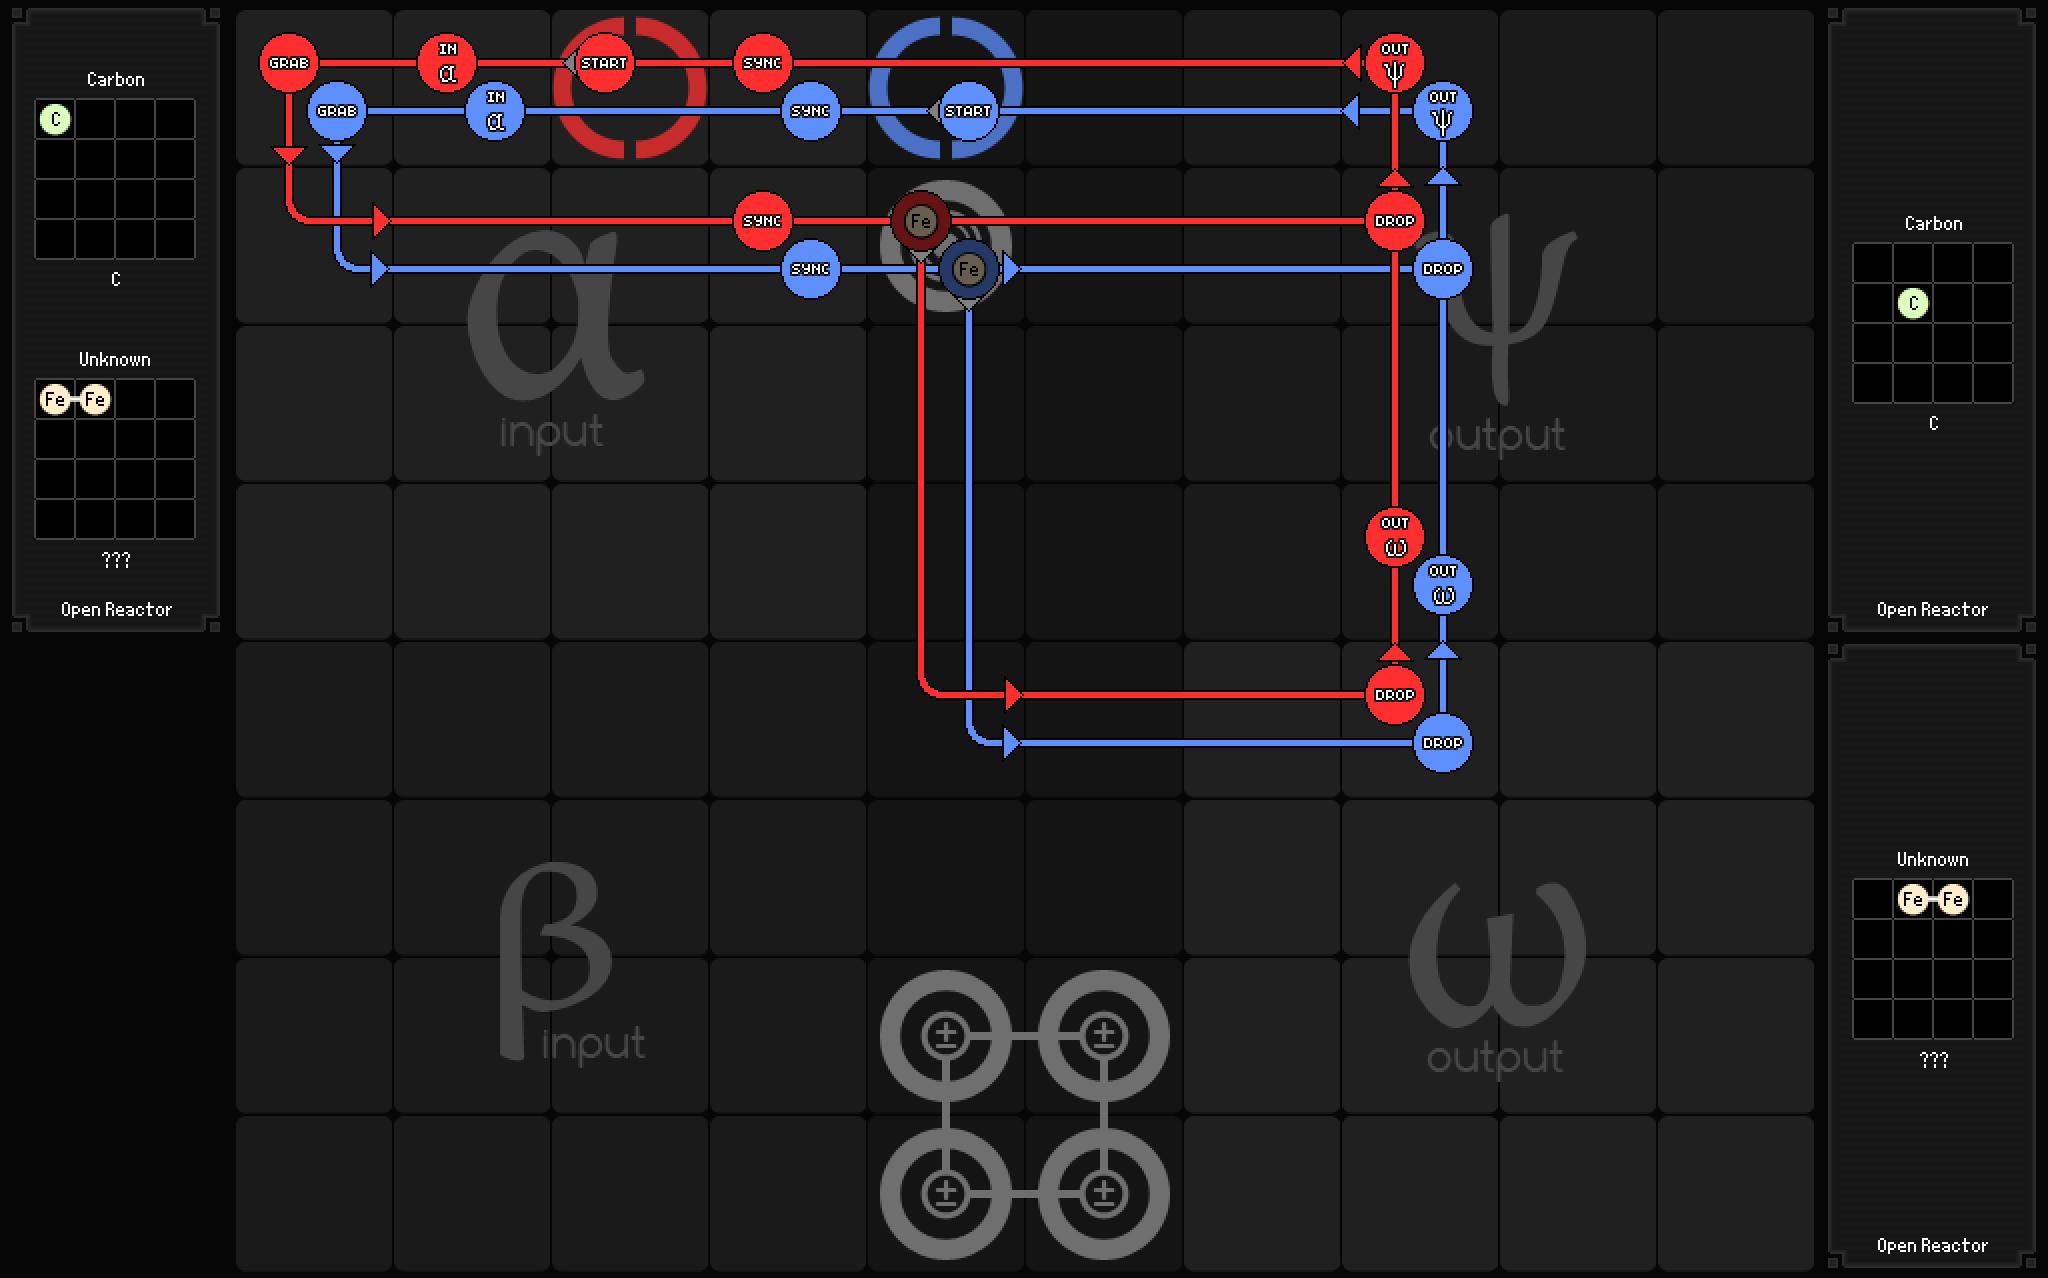 1_Story_Mode/6_Hephaestus_IV/SpaceChem-6.5.a/Reactor_2.png